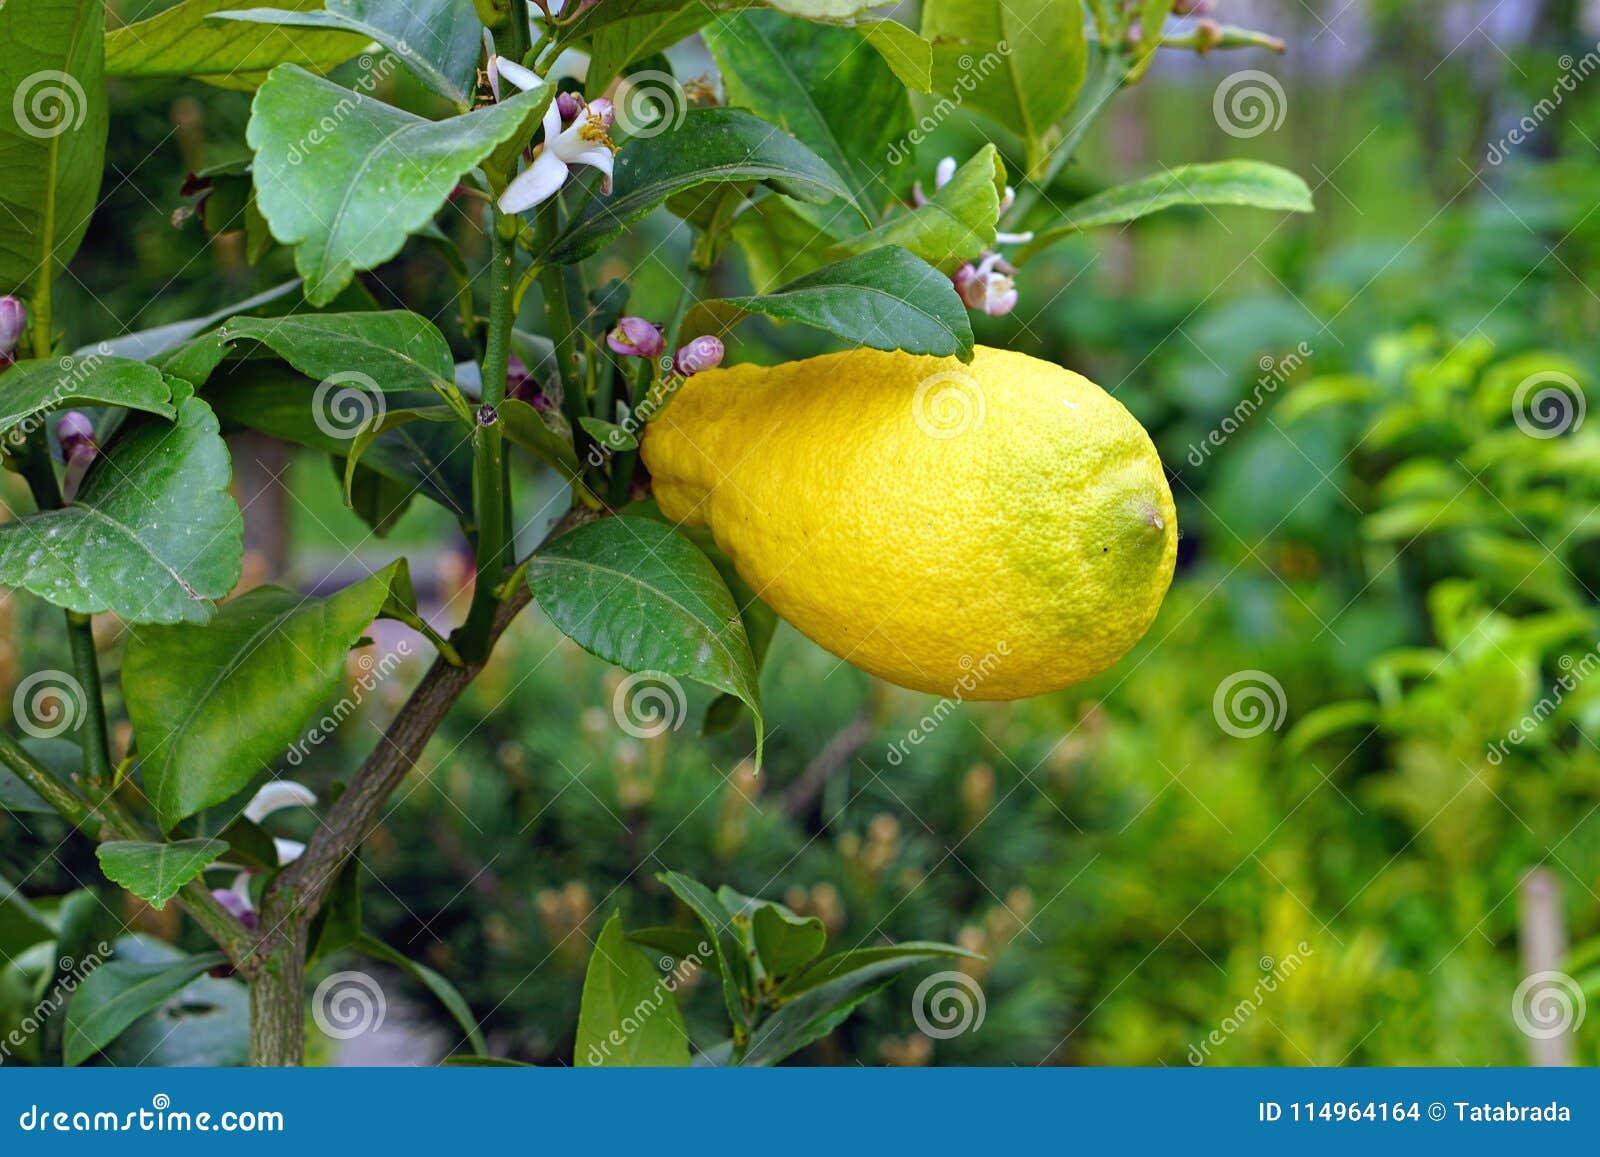 Citron på trädet